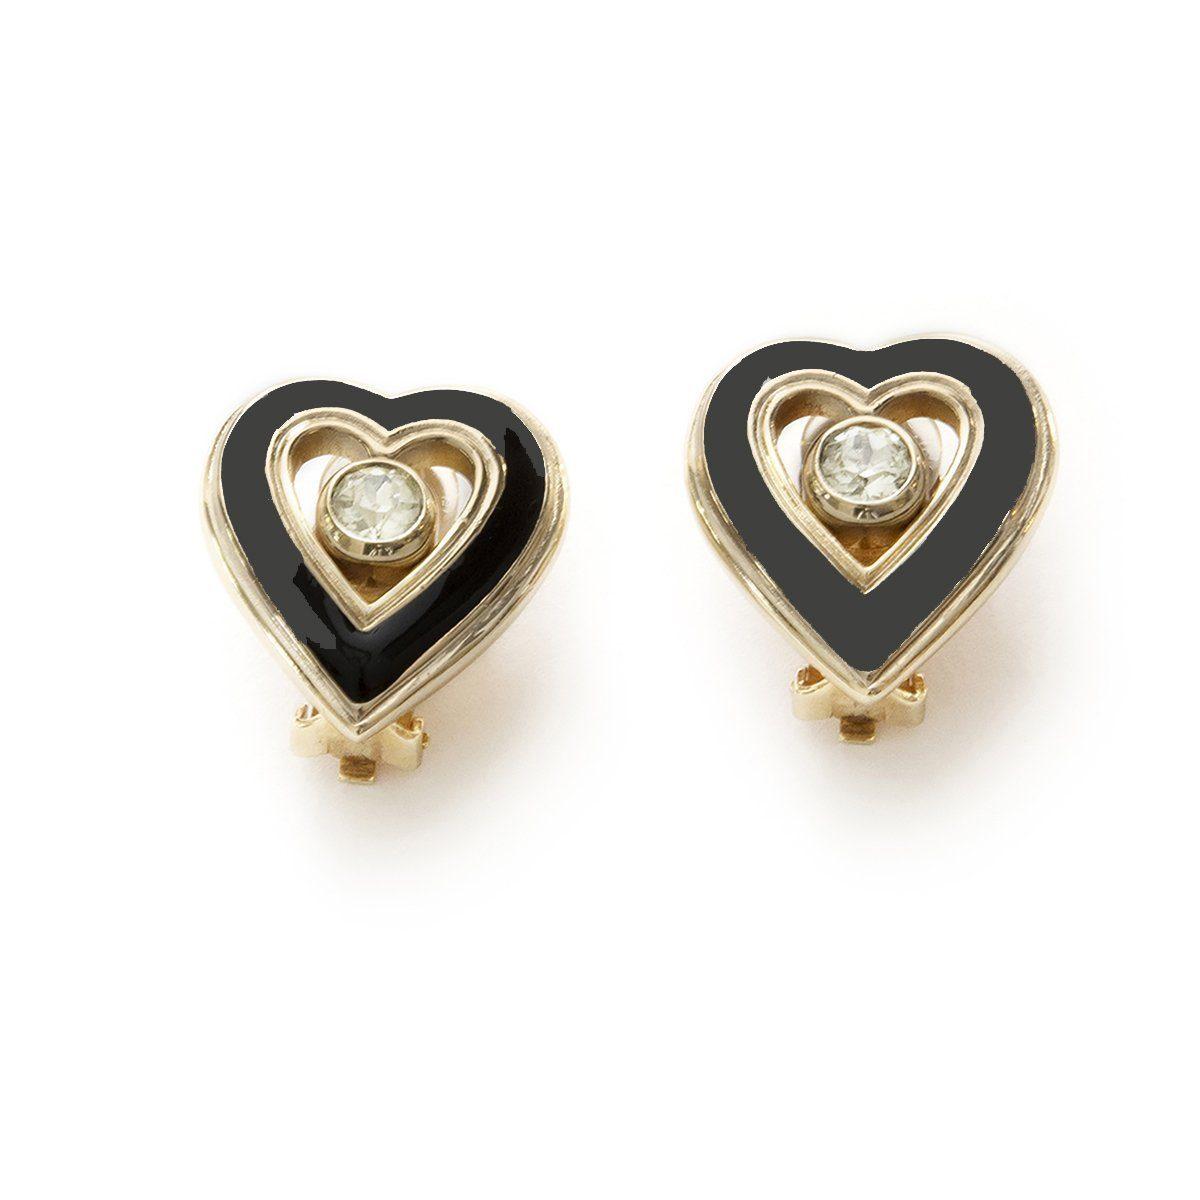 Vintage Christian Dior Heart Jewelry Set